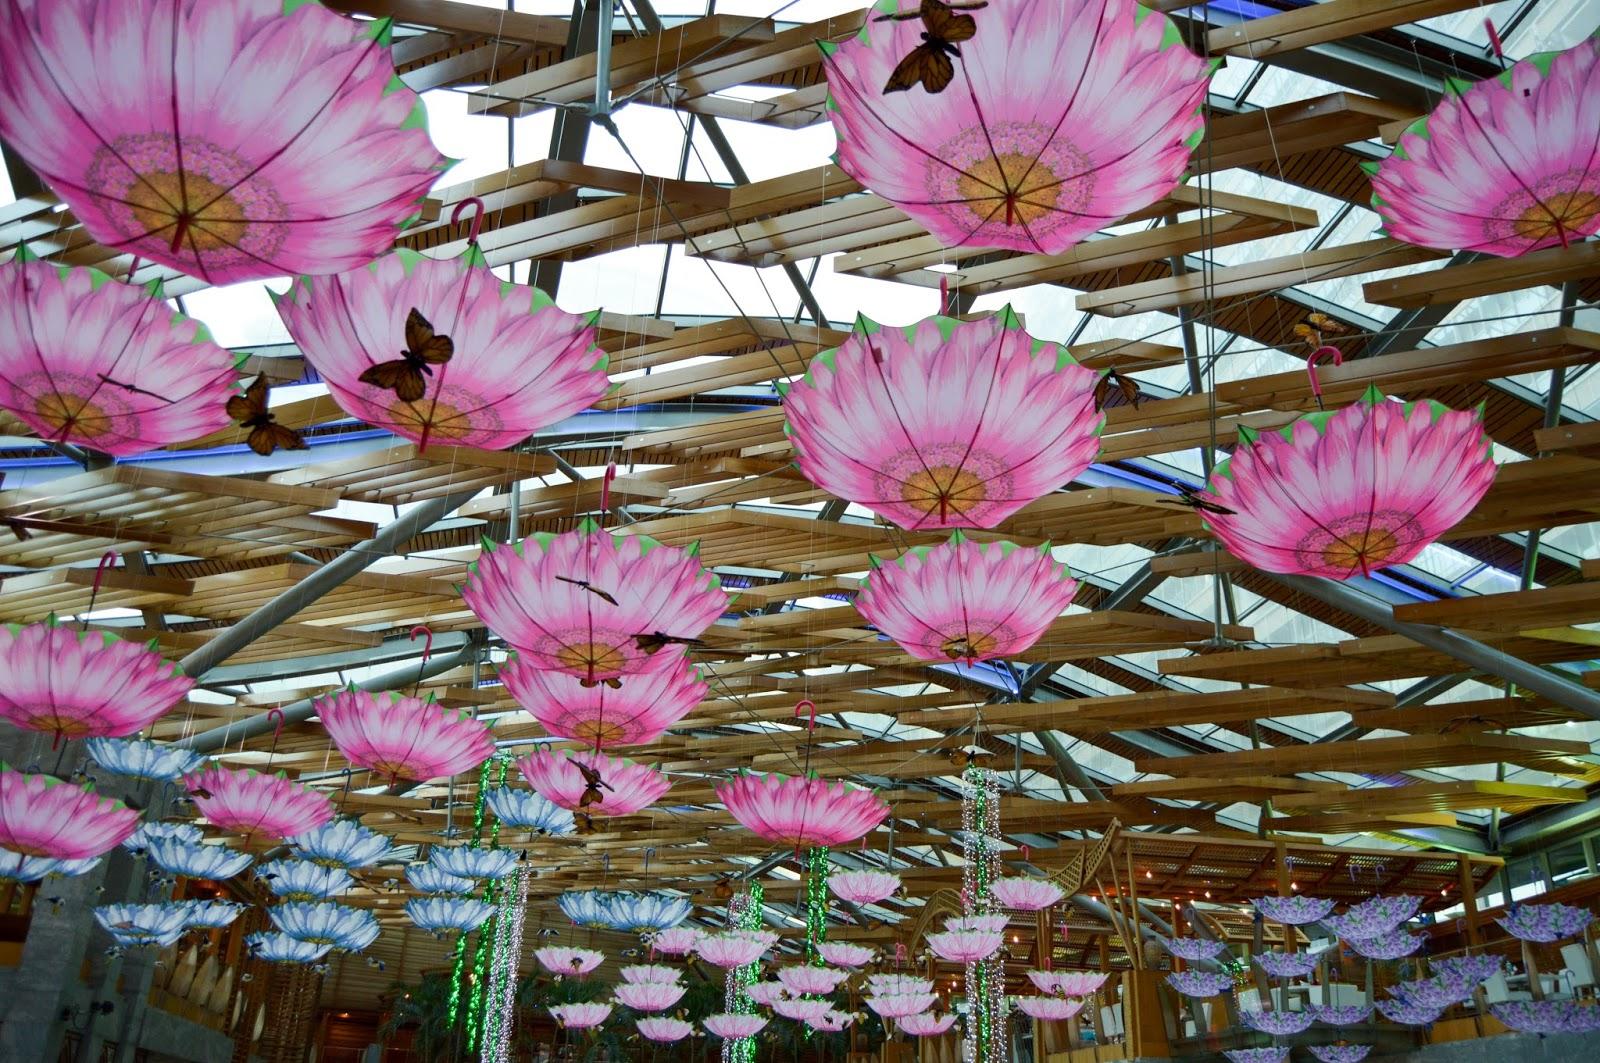 Beautiful Pink Umbrella Wallpapers - Free Stock Photos - Free Images - Free Wallpapers - Free Photos